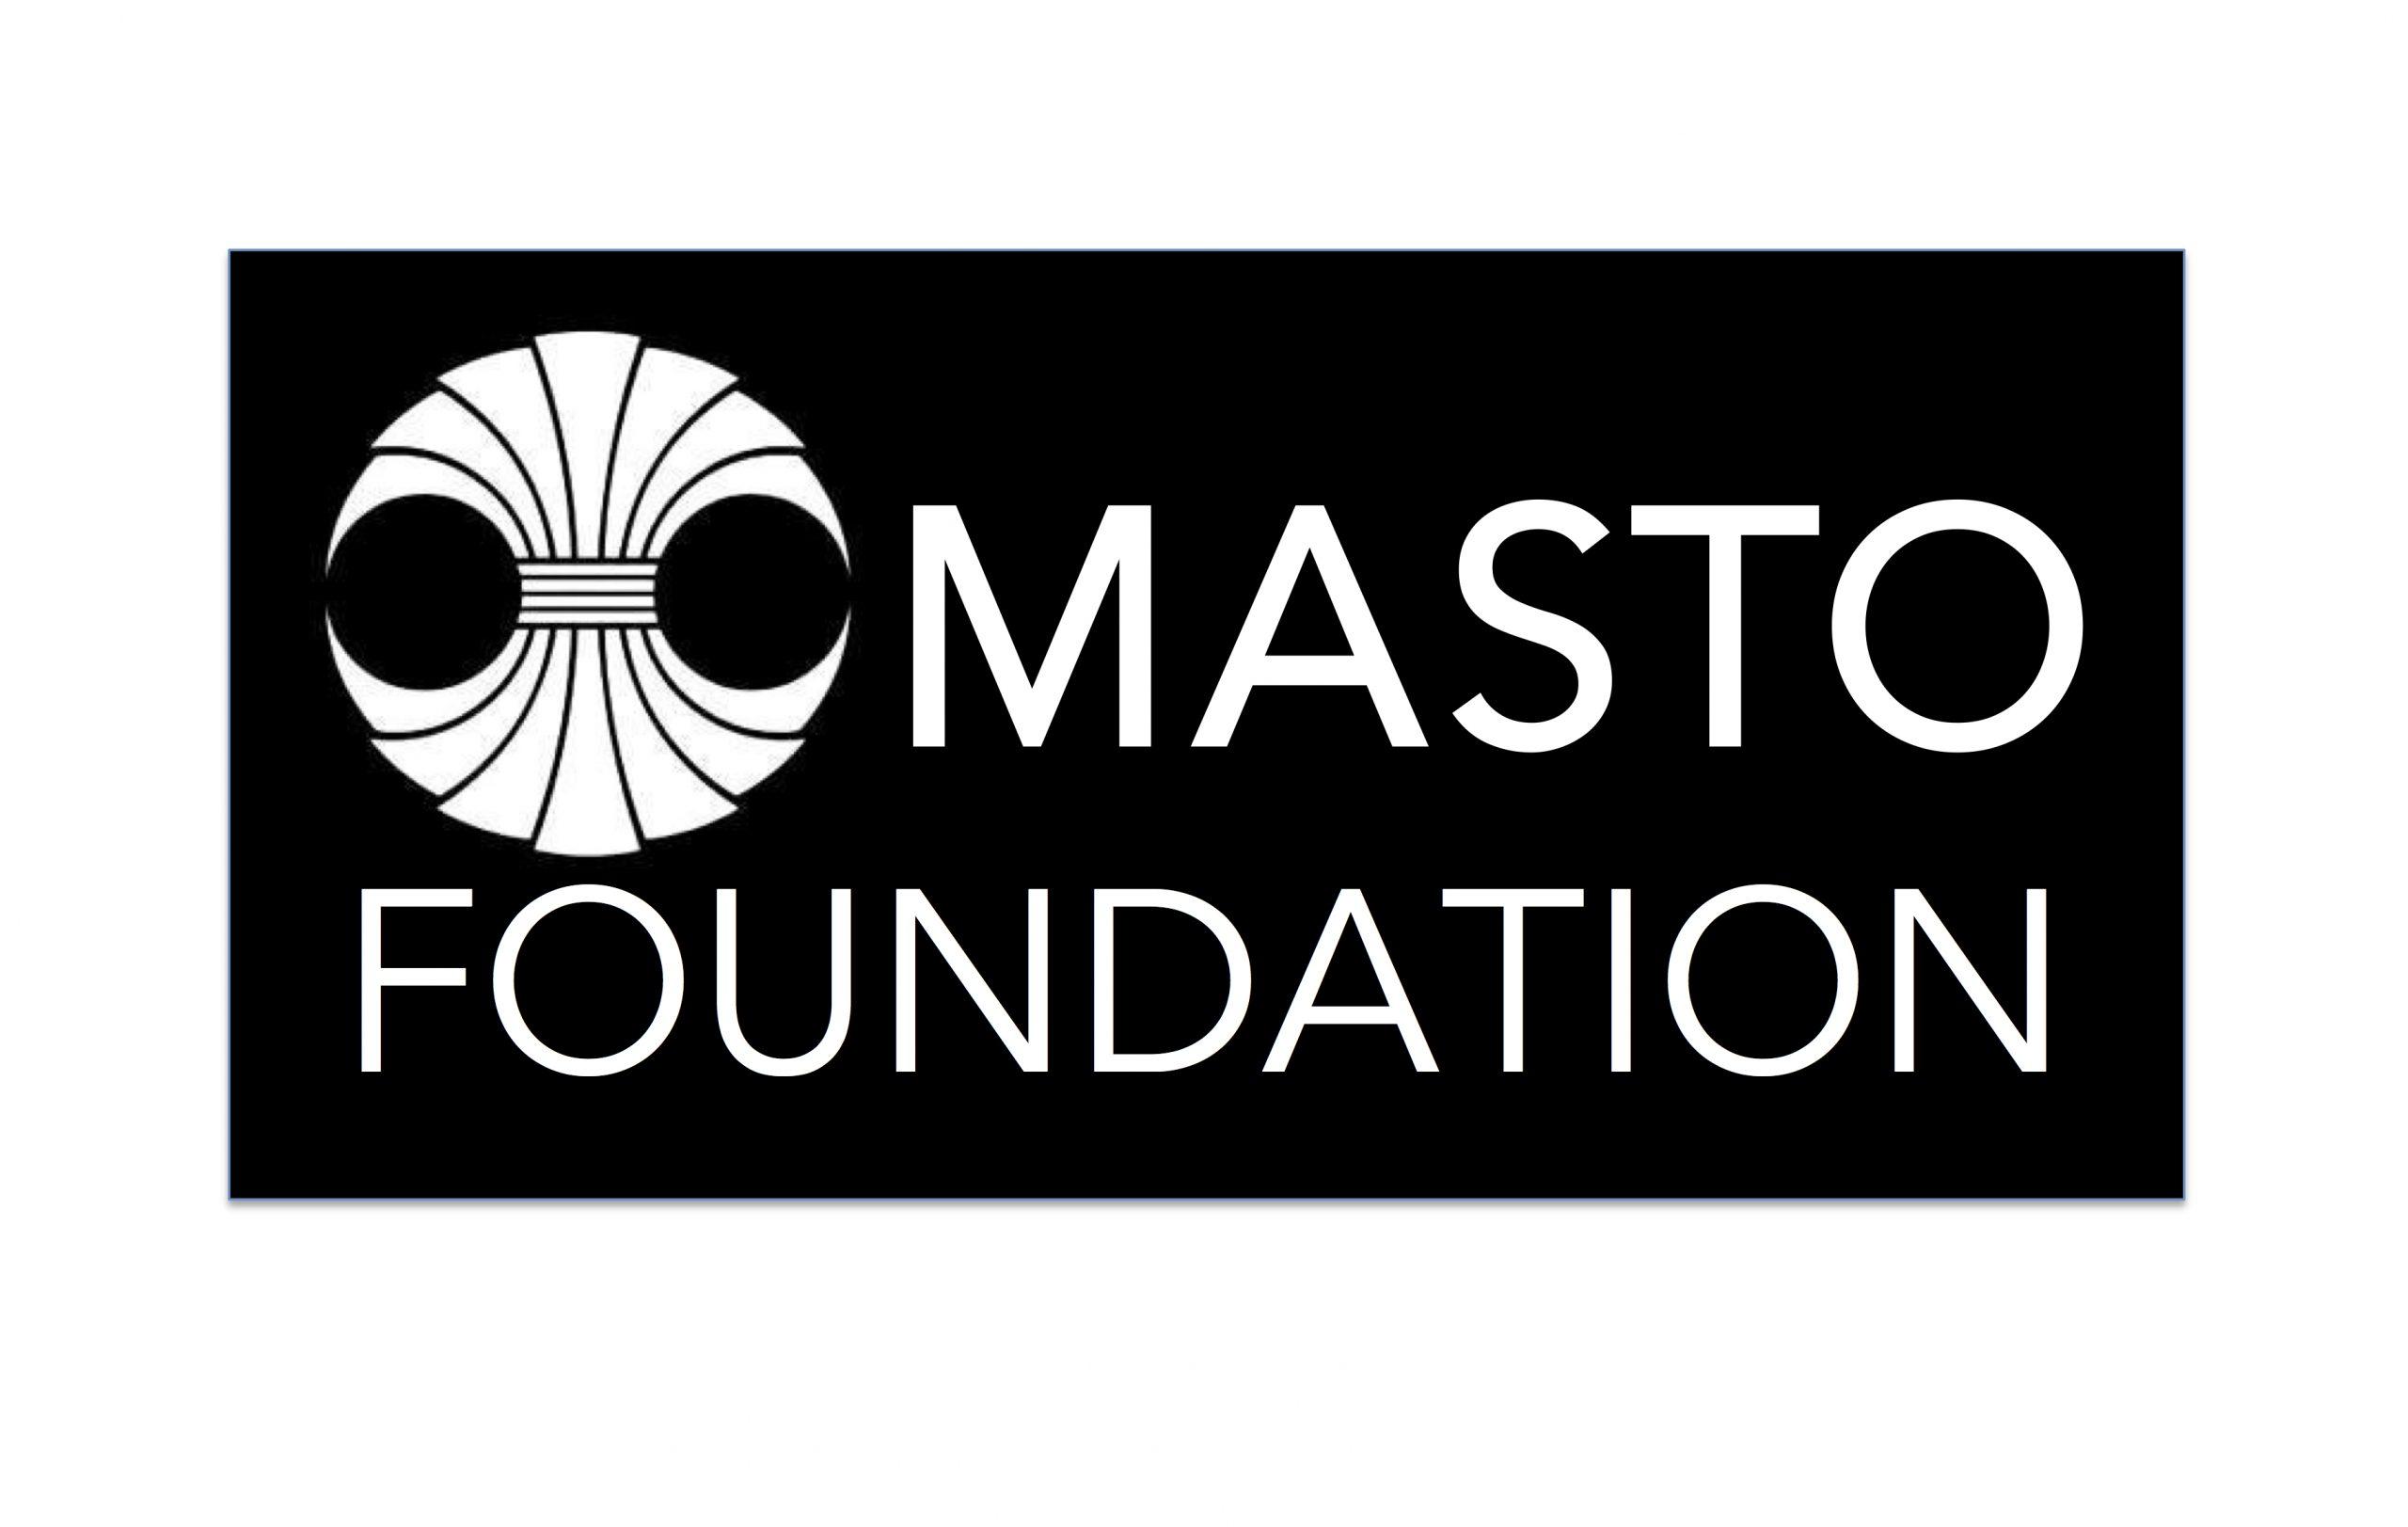 Masto Foundation logo